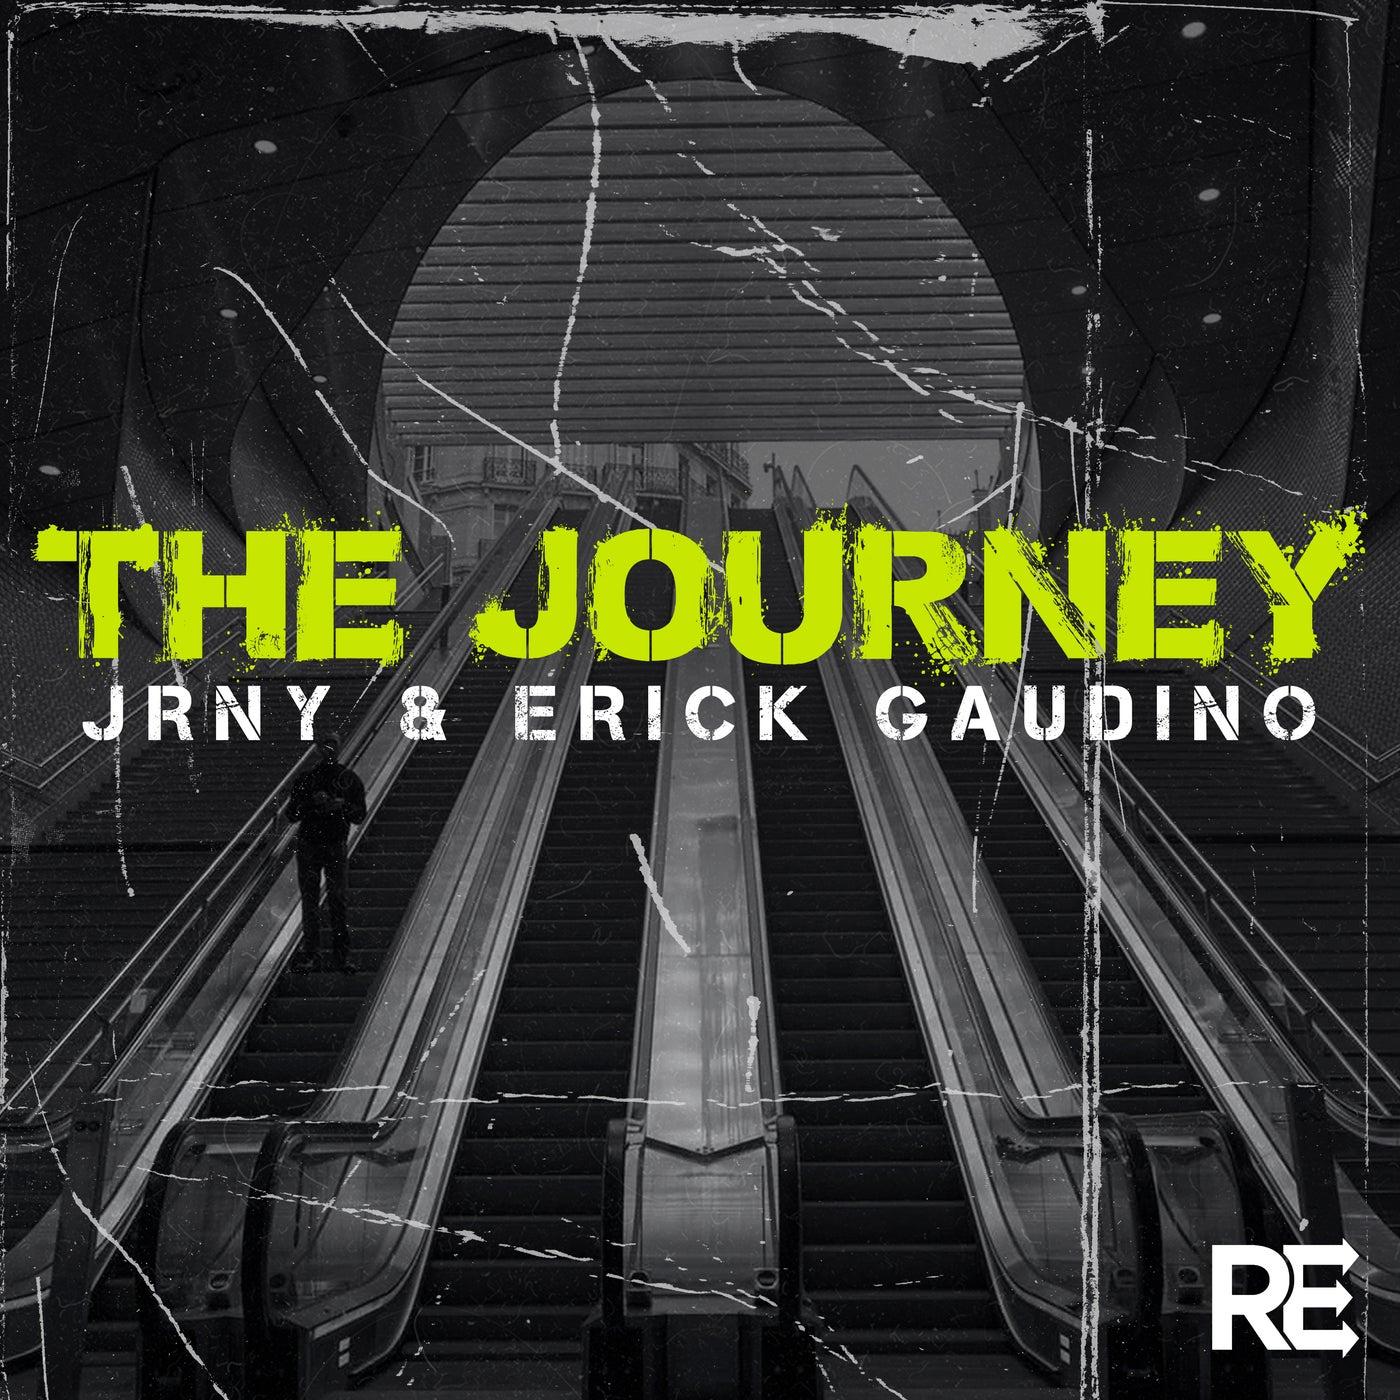 The Journey (JRNY-Pella)